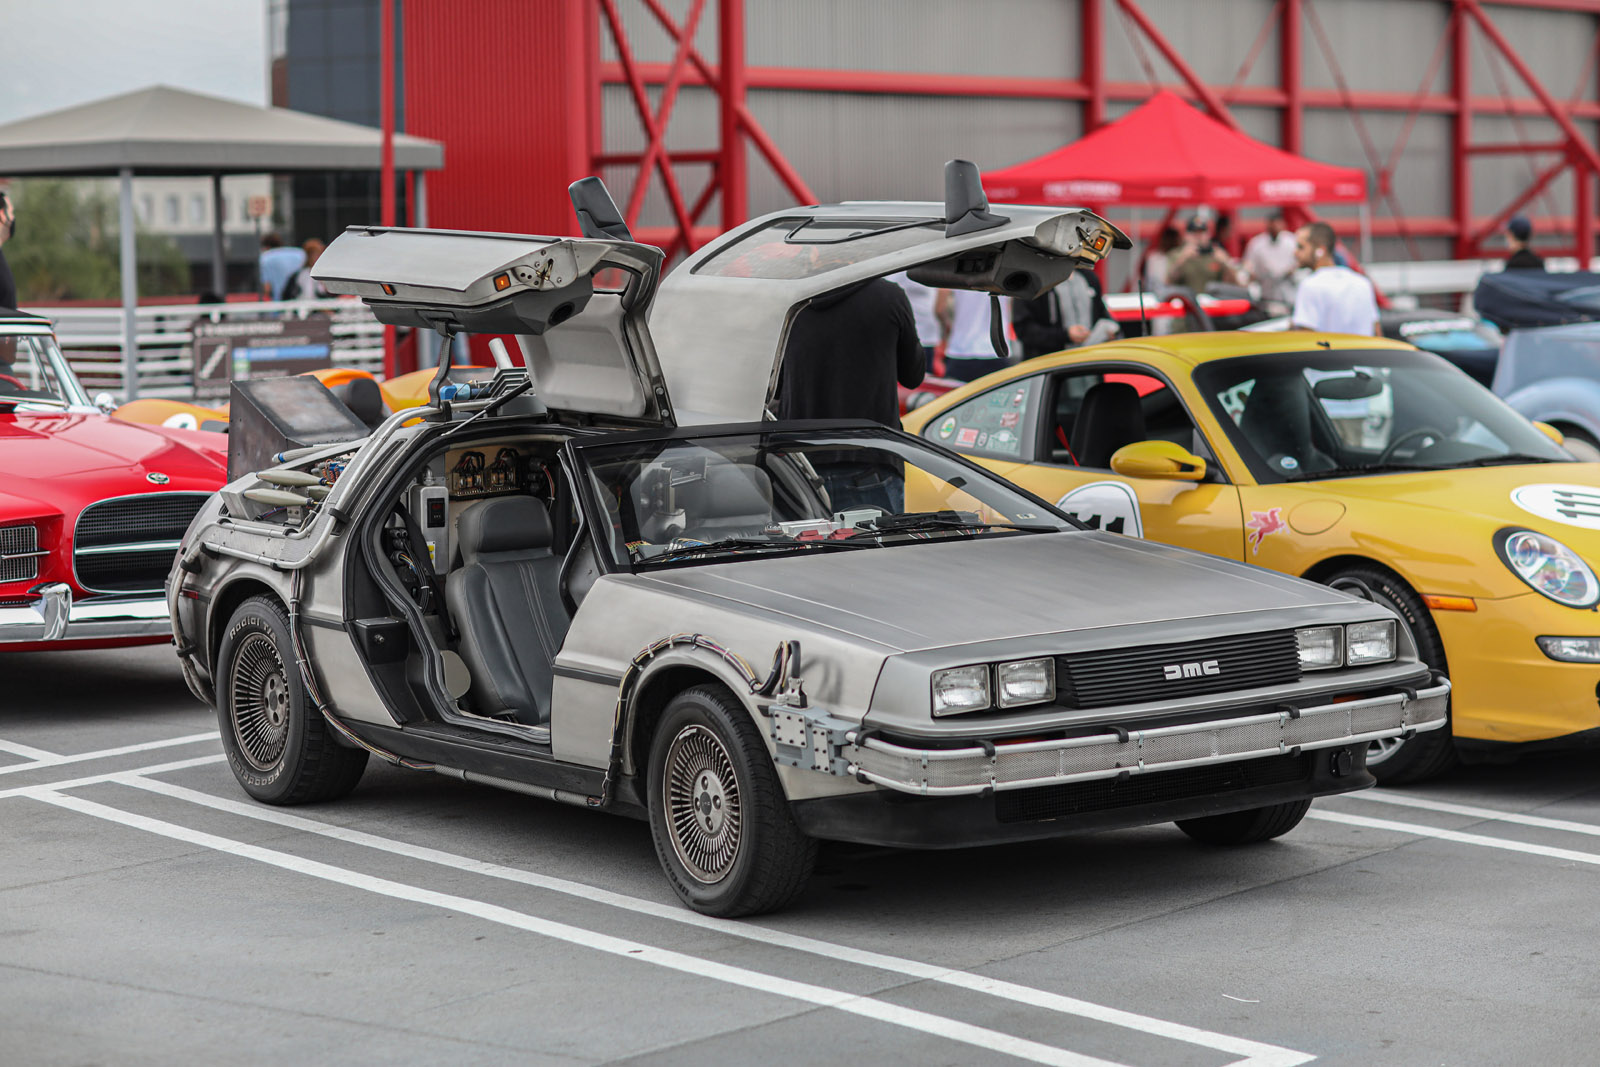 DeLorean time machine Beverly Hills Tour